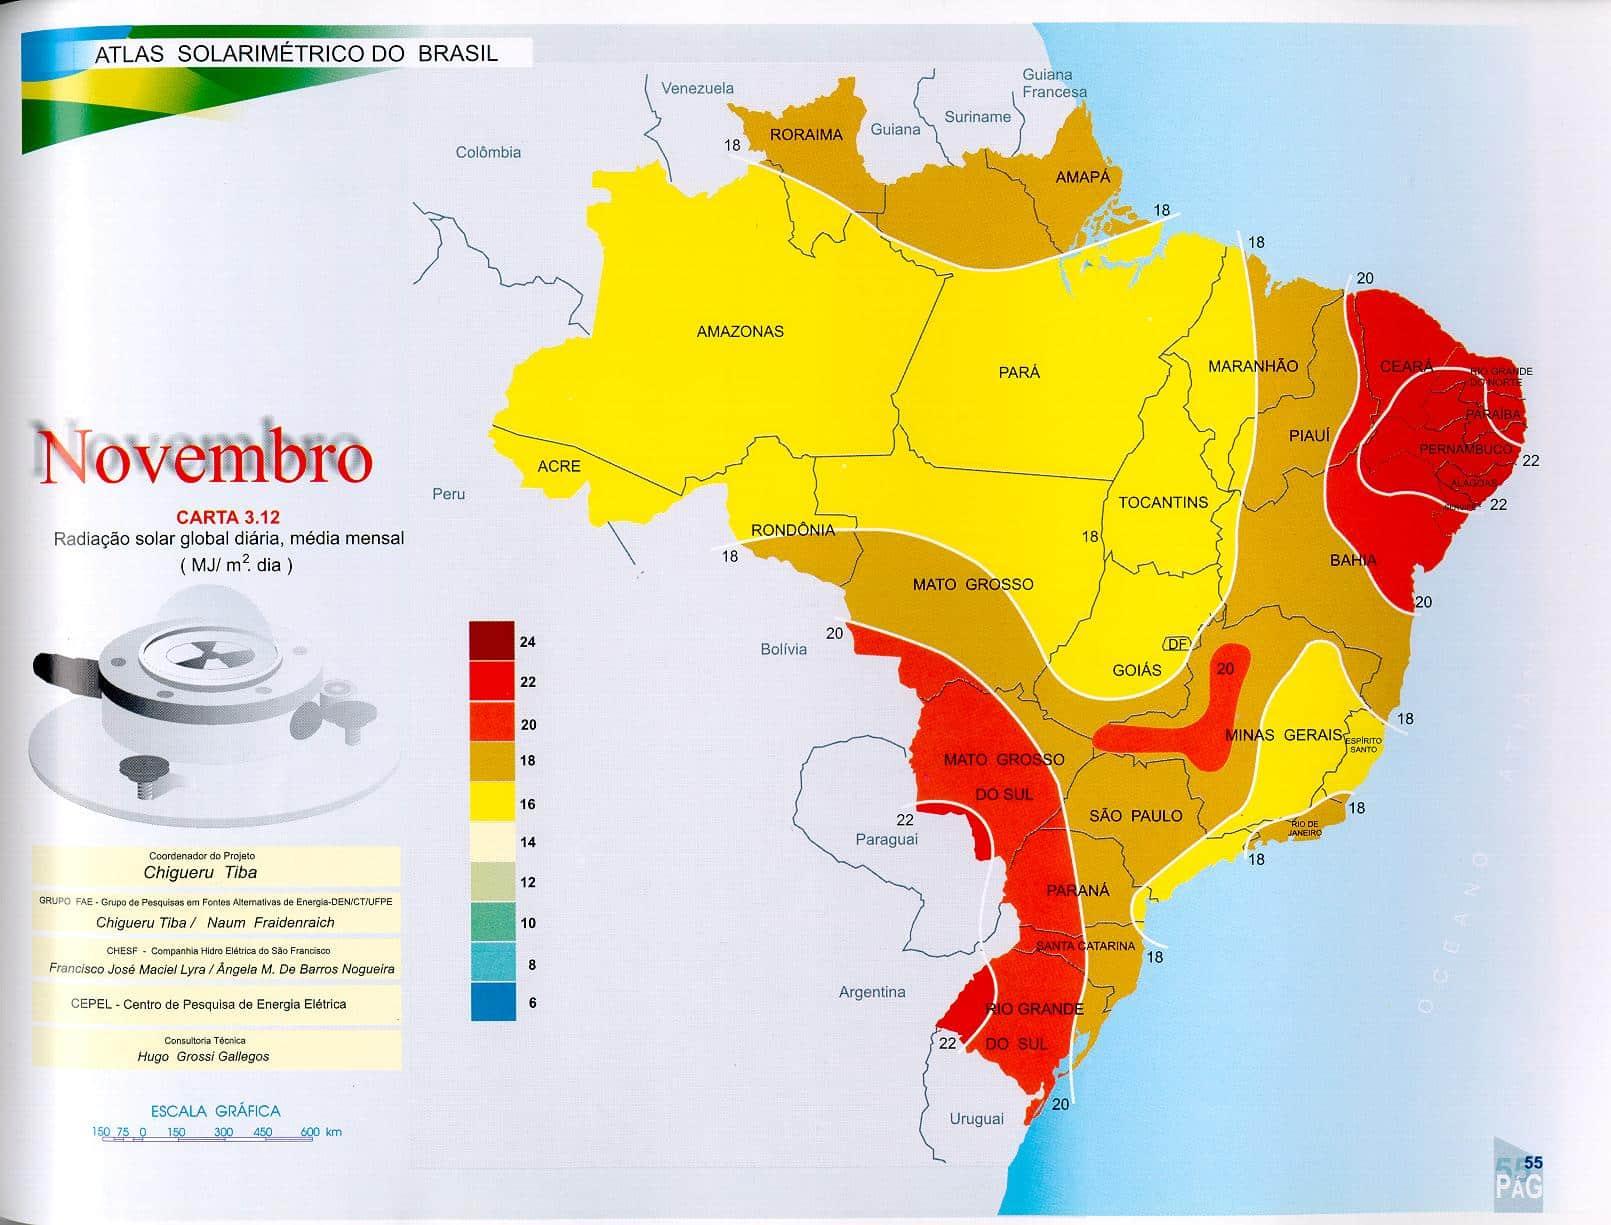 Atlas Solarimetrico do Brasil